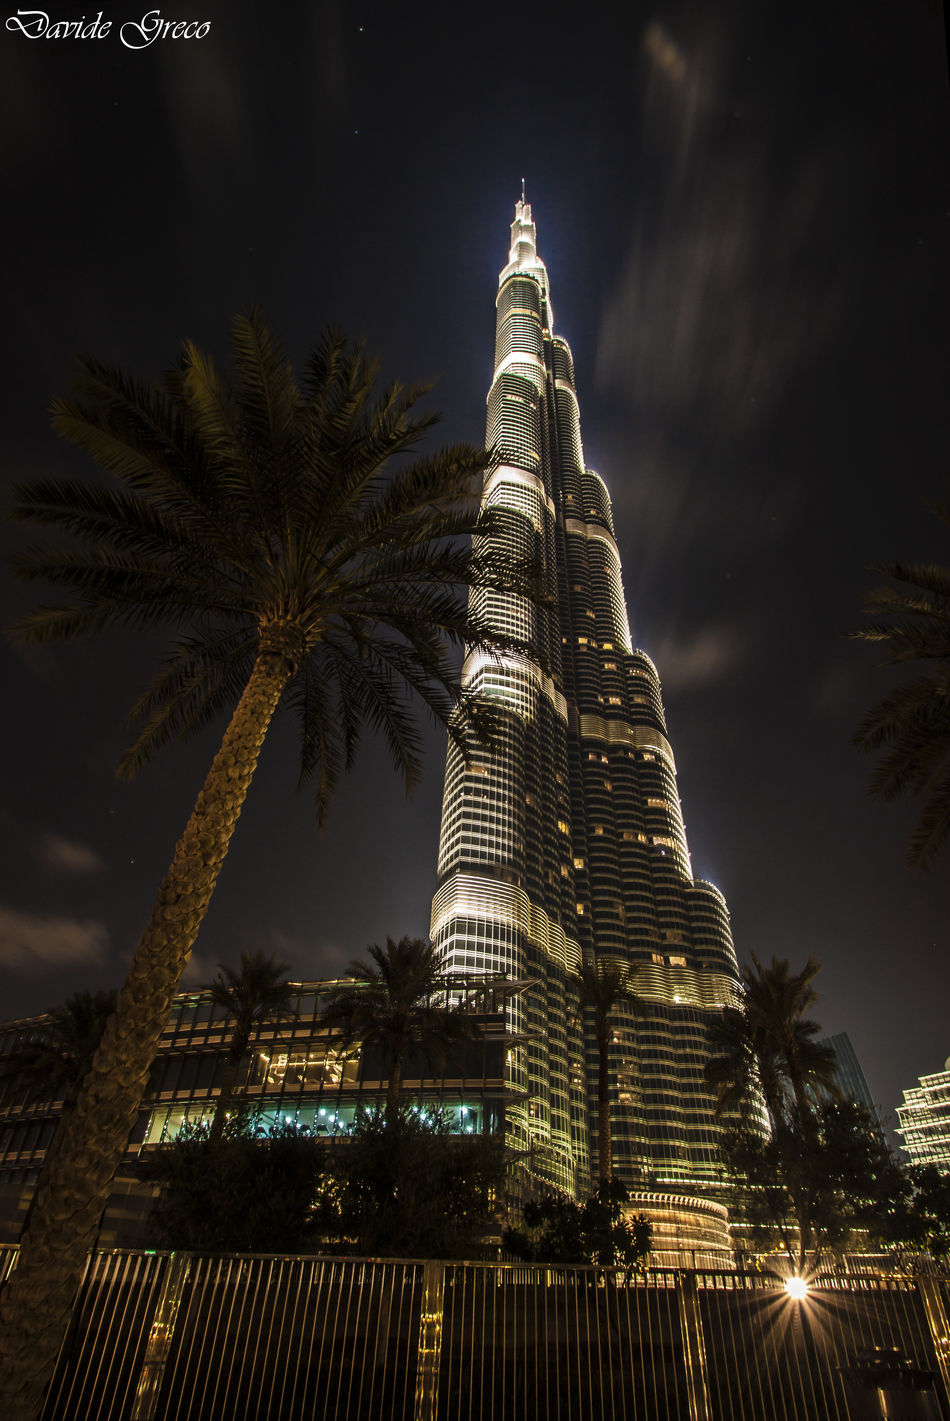 Dubai Burj Khakifa Amazing View Expensive Thetraveler-2015EyemAwards Thegreatoutdoors2015EyeemAwards